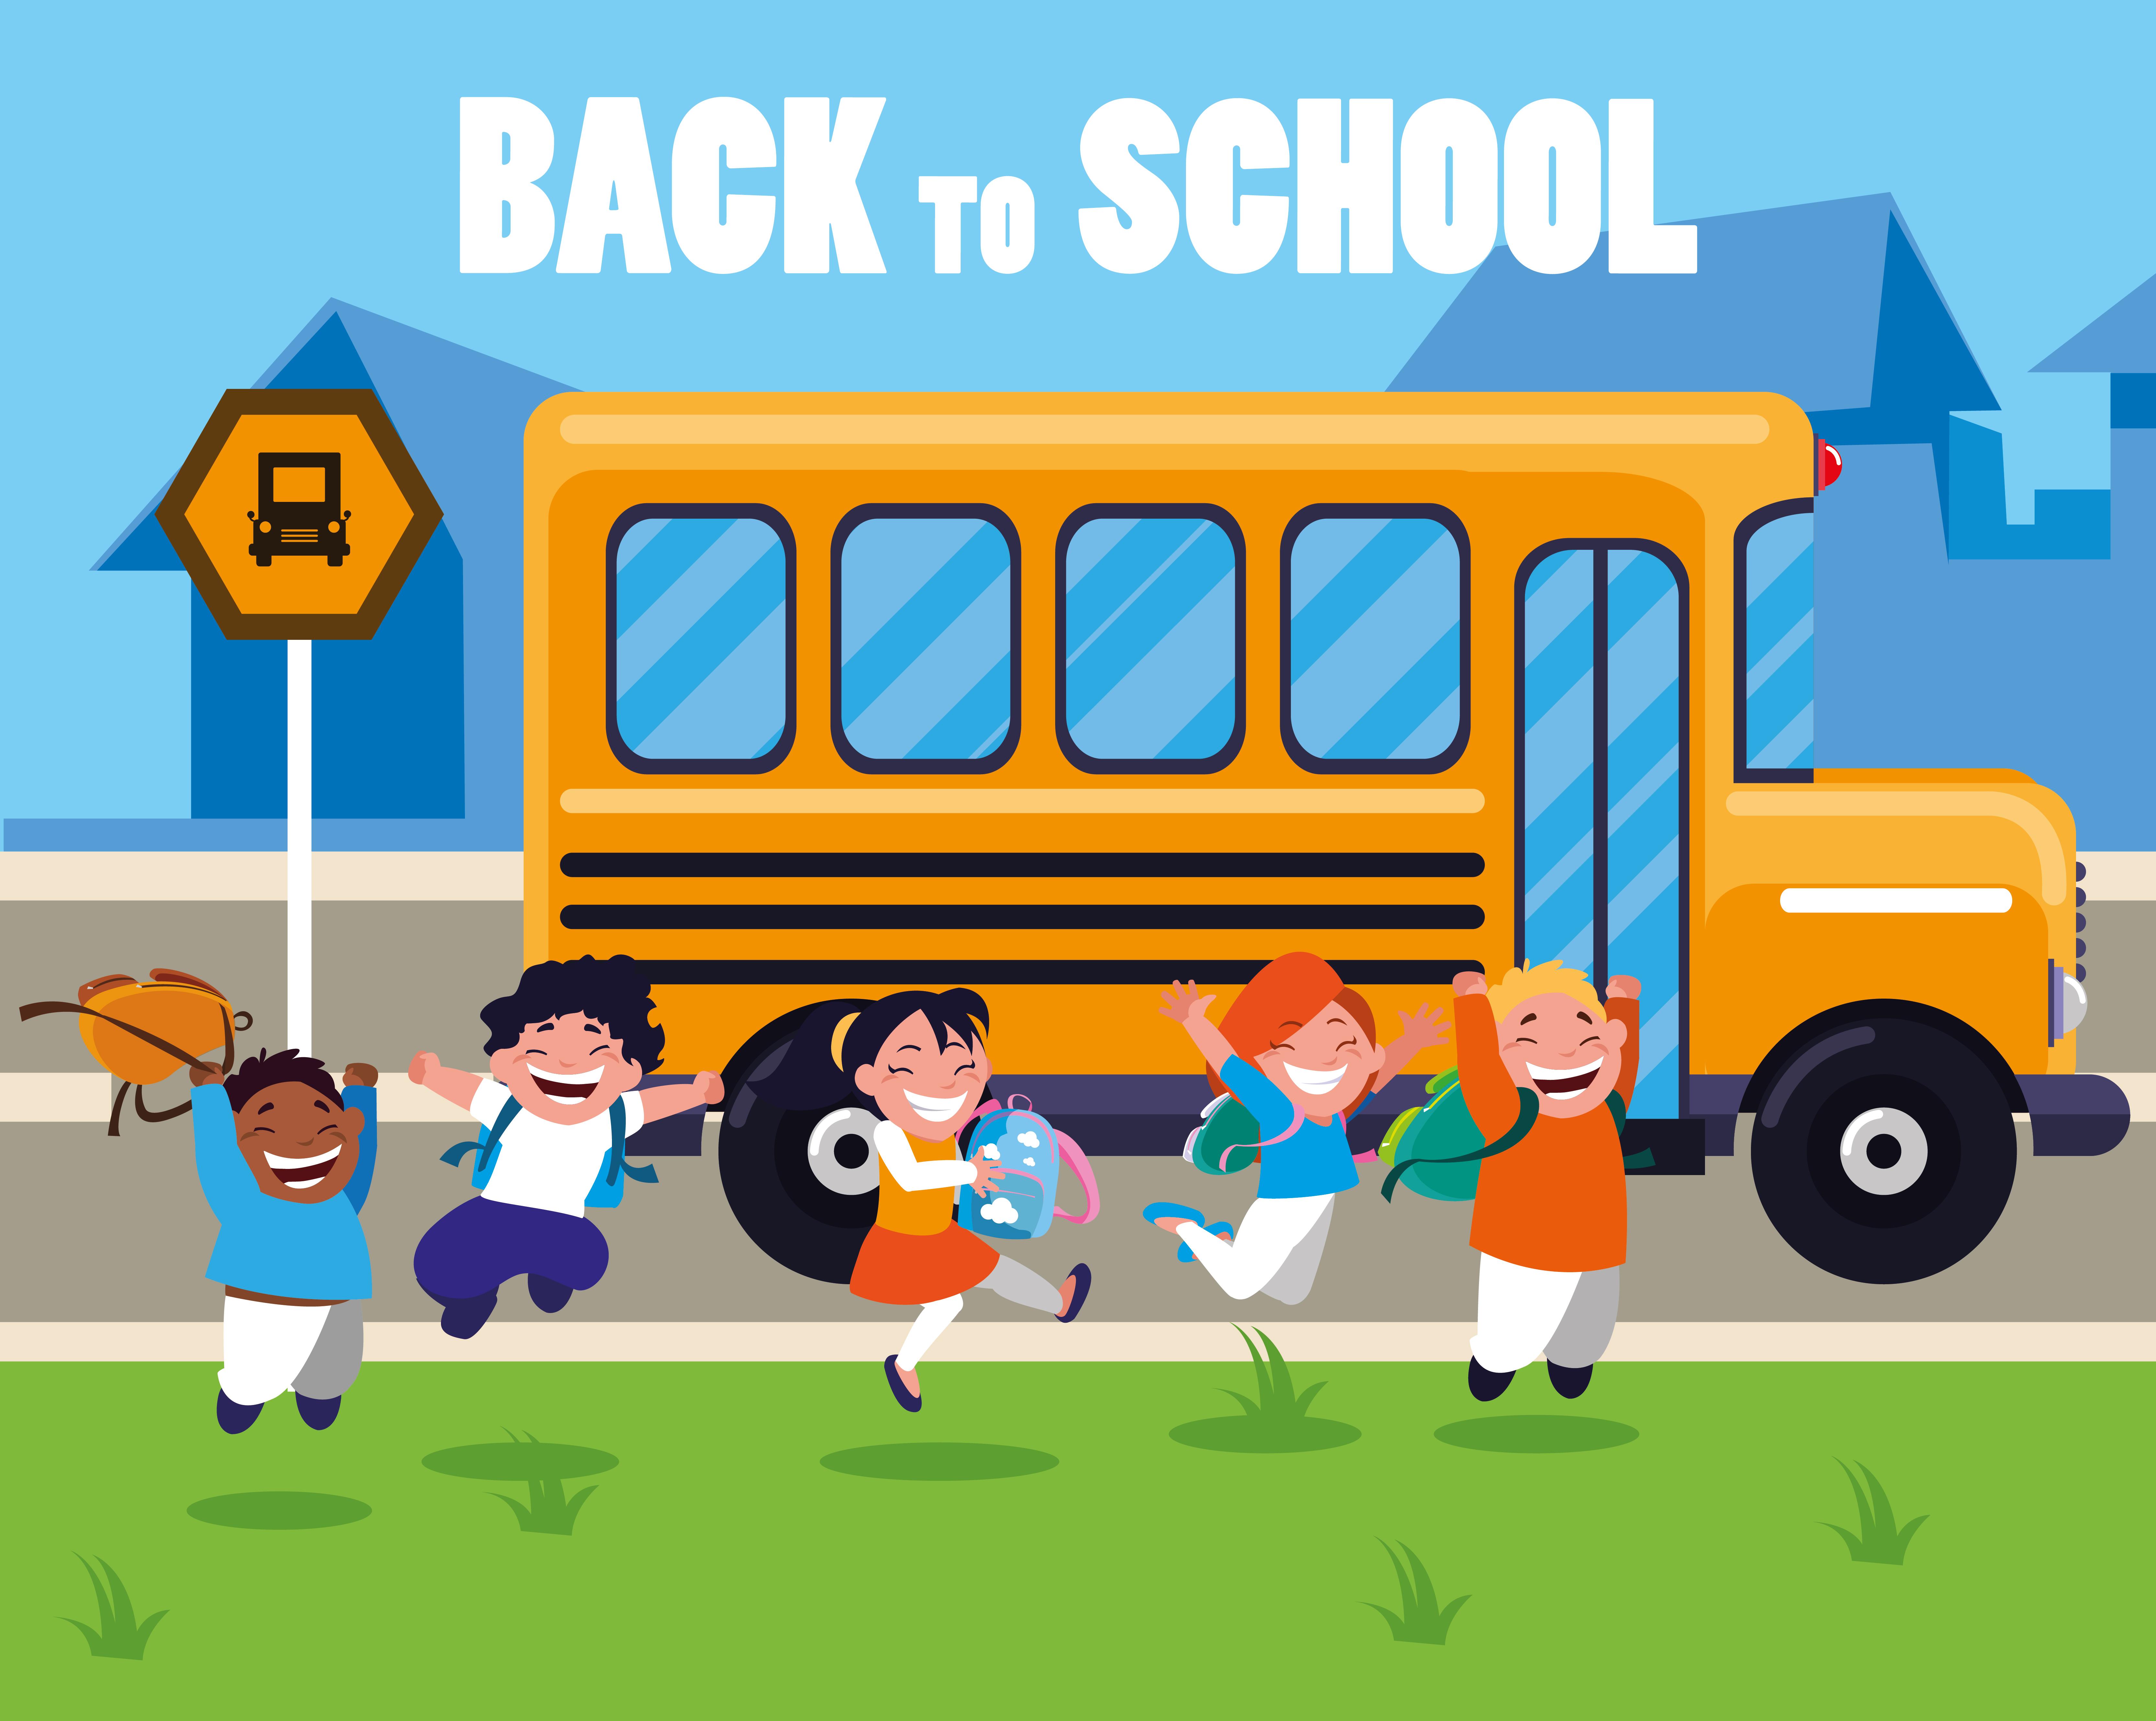 Happy Students At The School Bus Stop Download Free Vectors